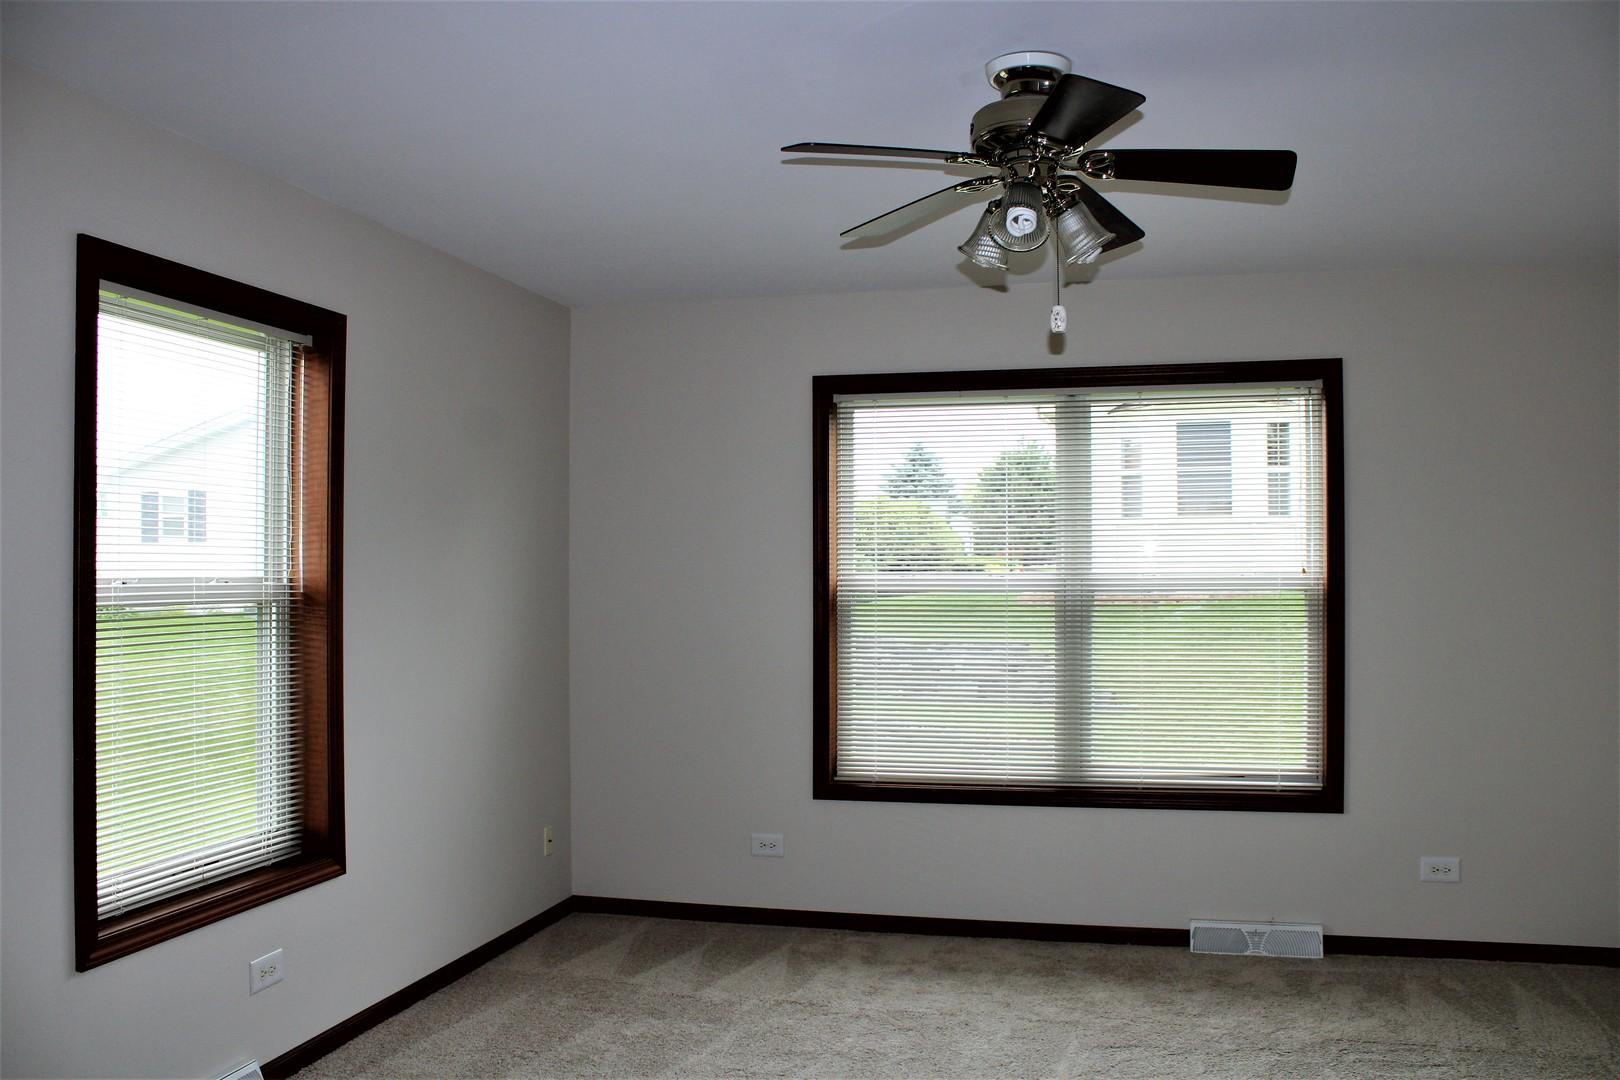 909 Shetland, Grayslake, Illinois, 60030